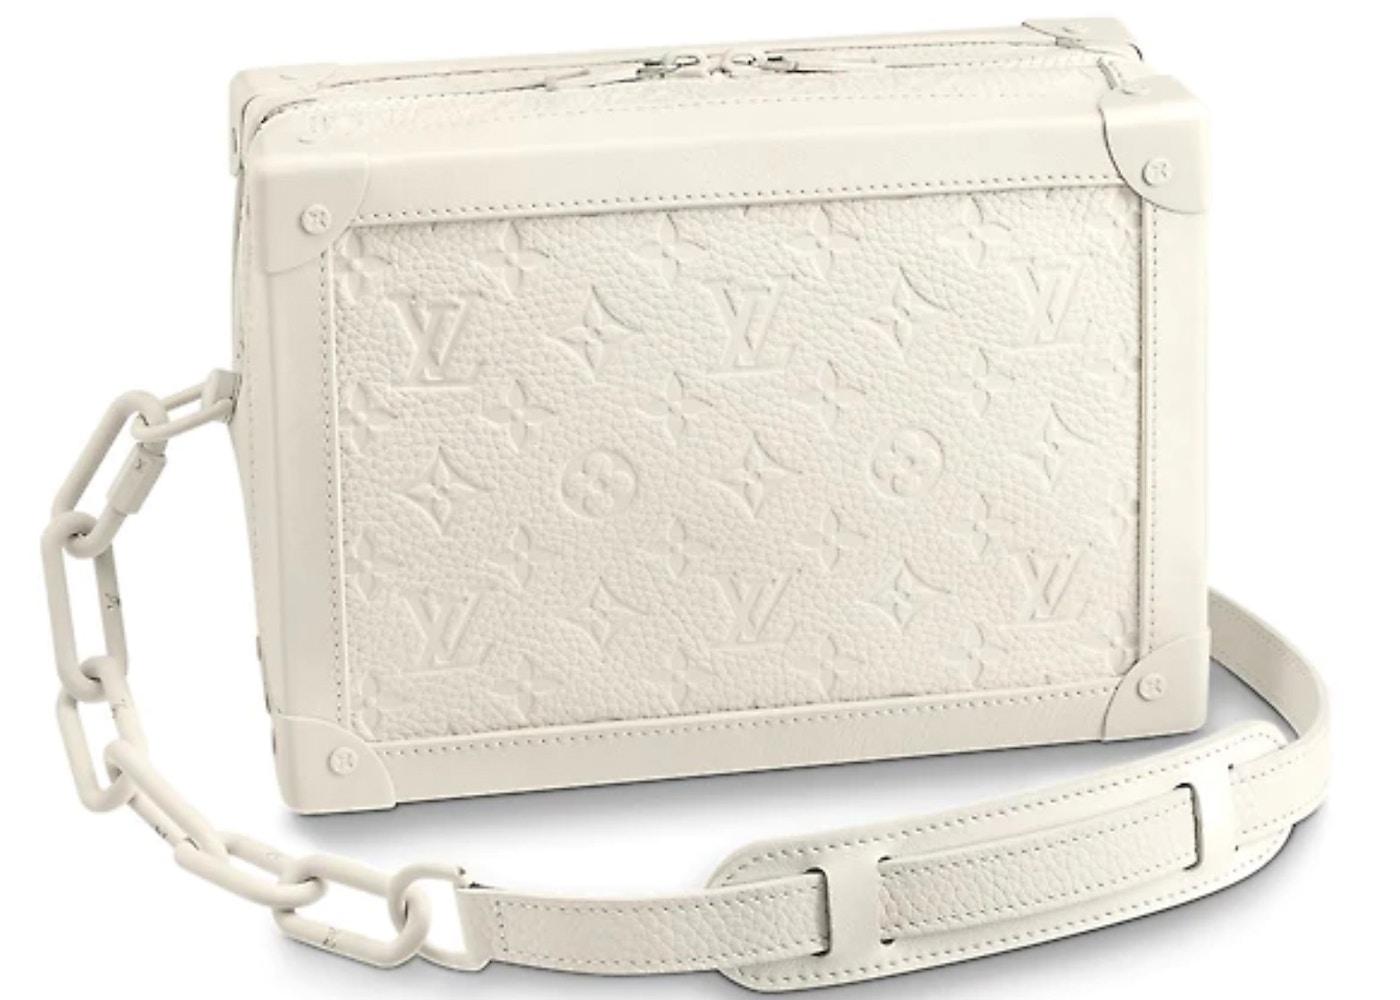 HypeAnalyzer · Louis Vuitton Soft Trunk Monogram Powder White d5367fe6ed436